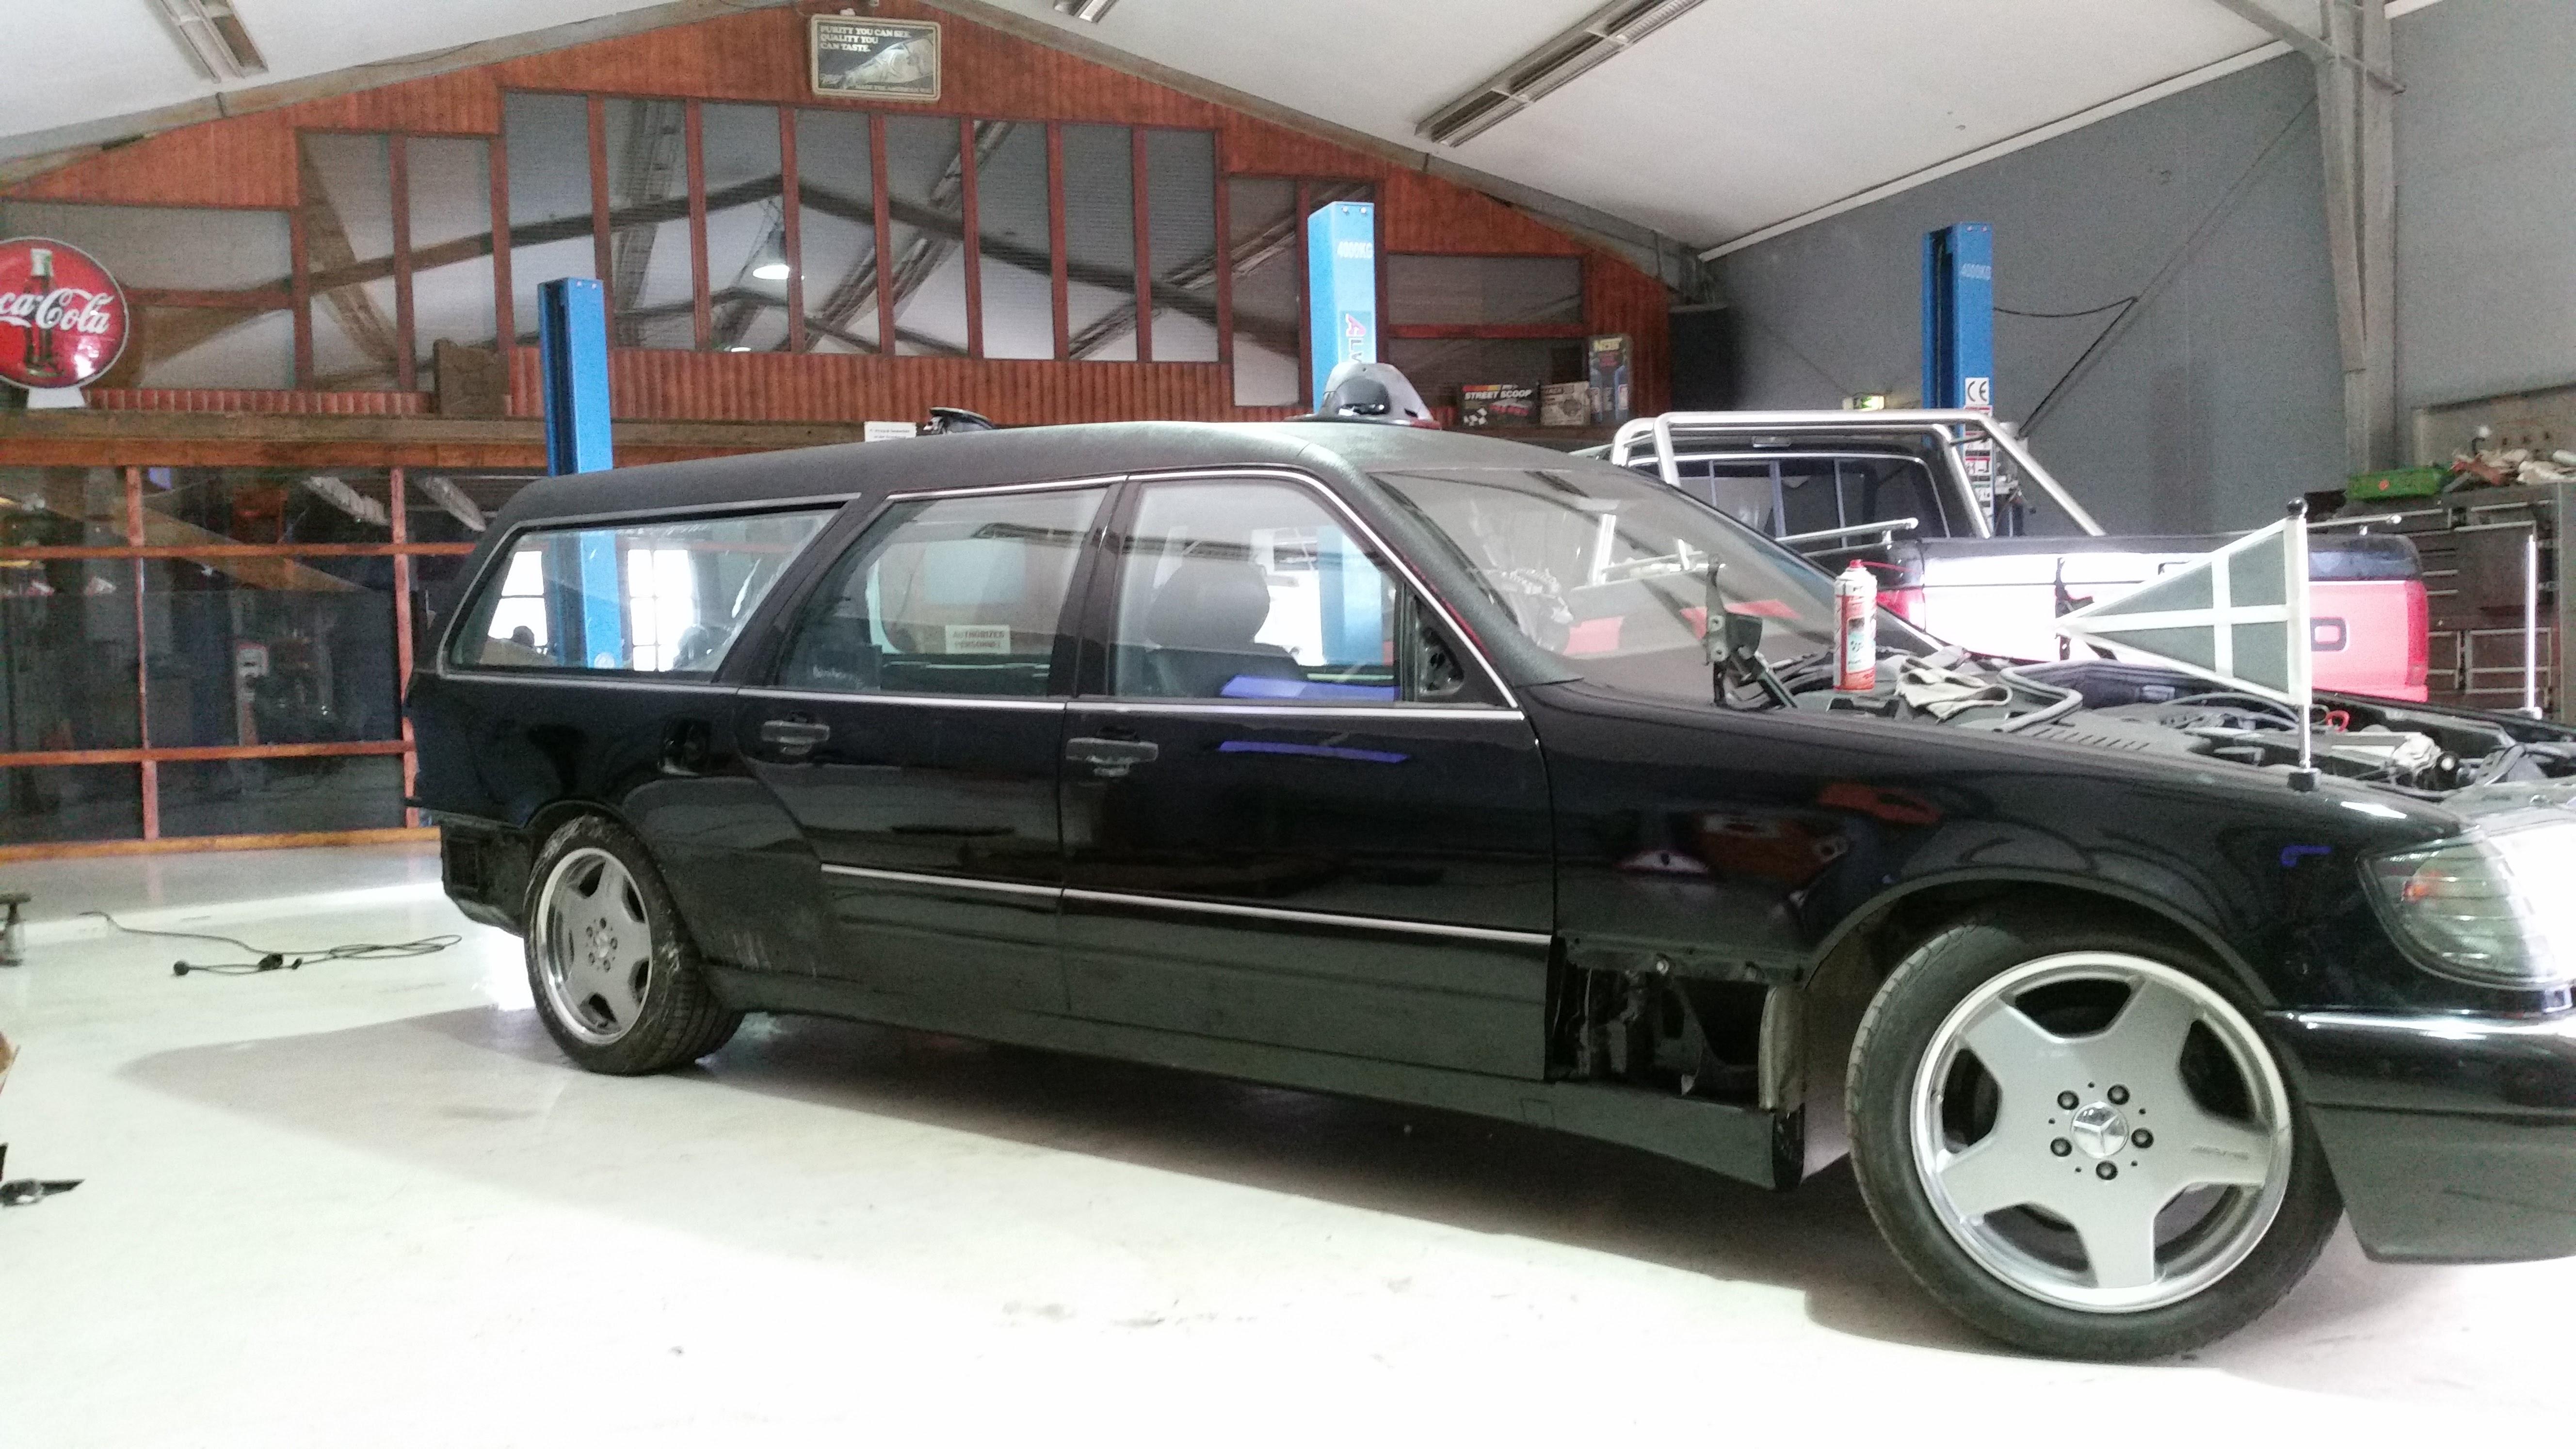 Mercedes W S Klassse Kombi on 1997 Dodge B3500